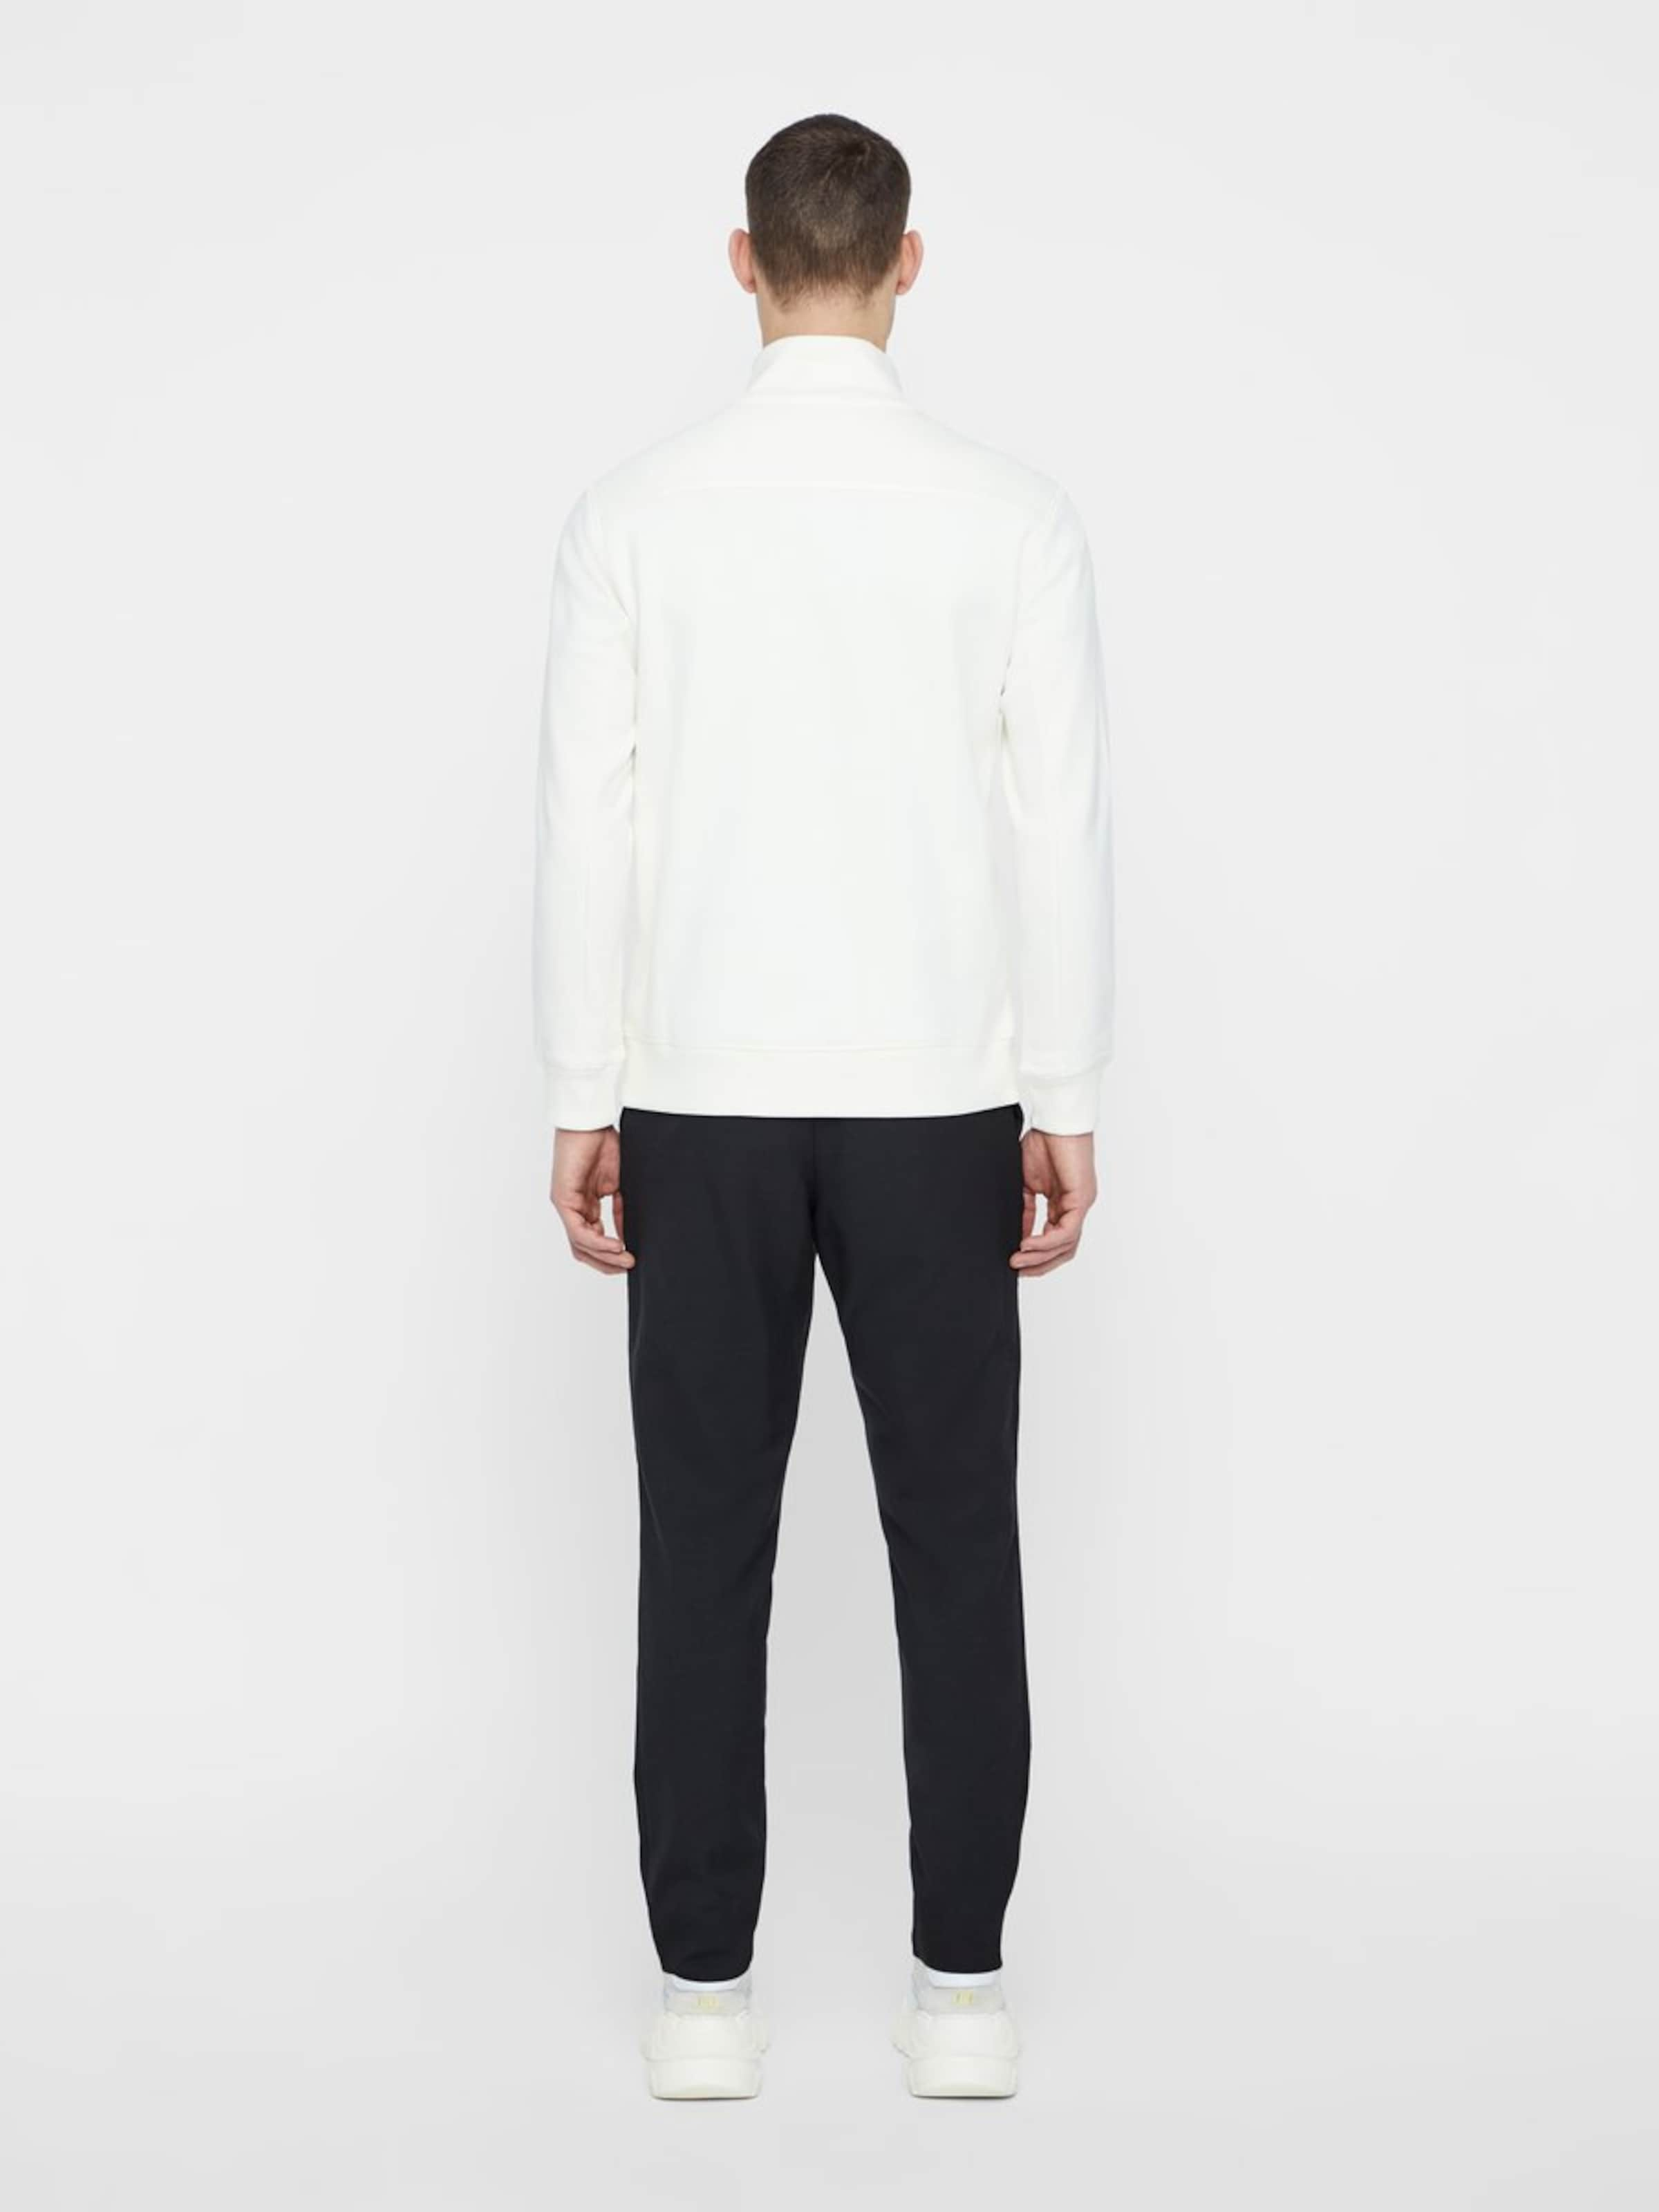 lindeberg J shirt En Sweat Jaune 'koby' D'or Okn0PX8w